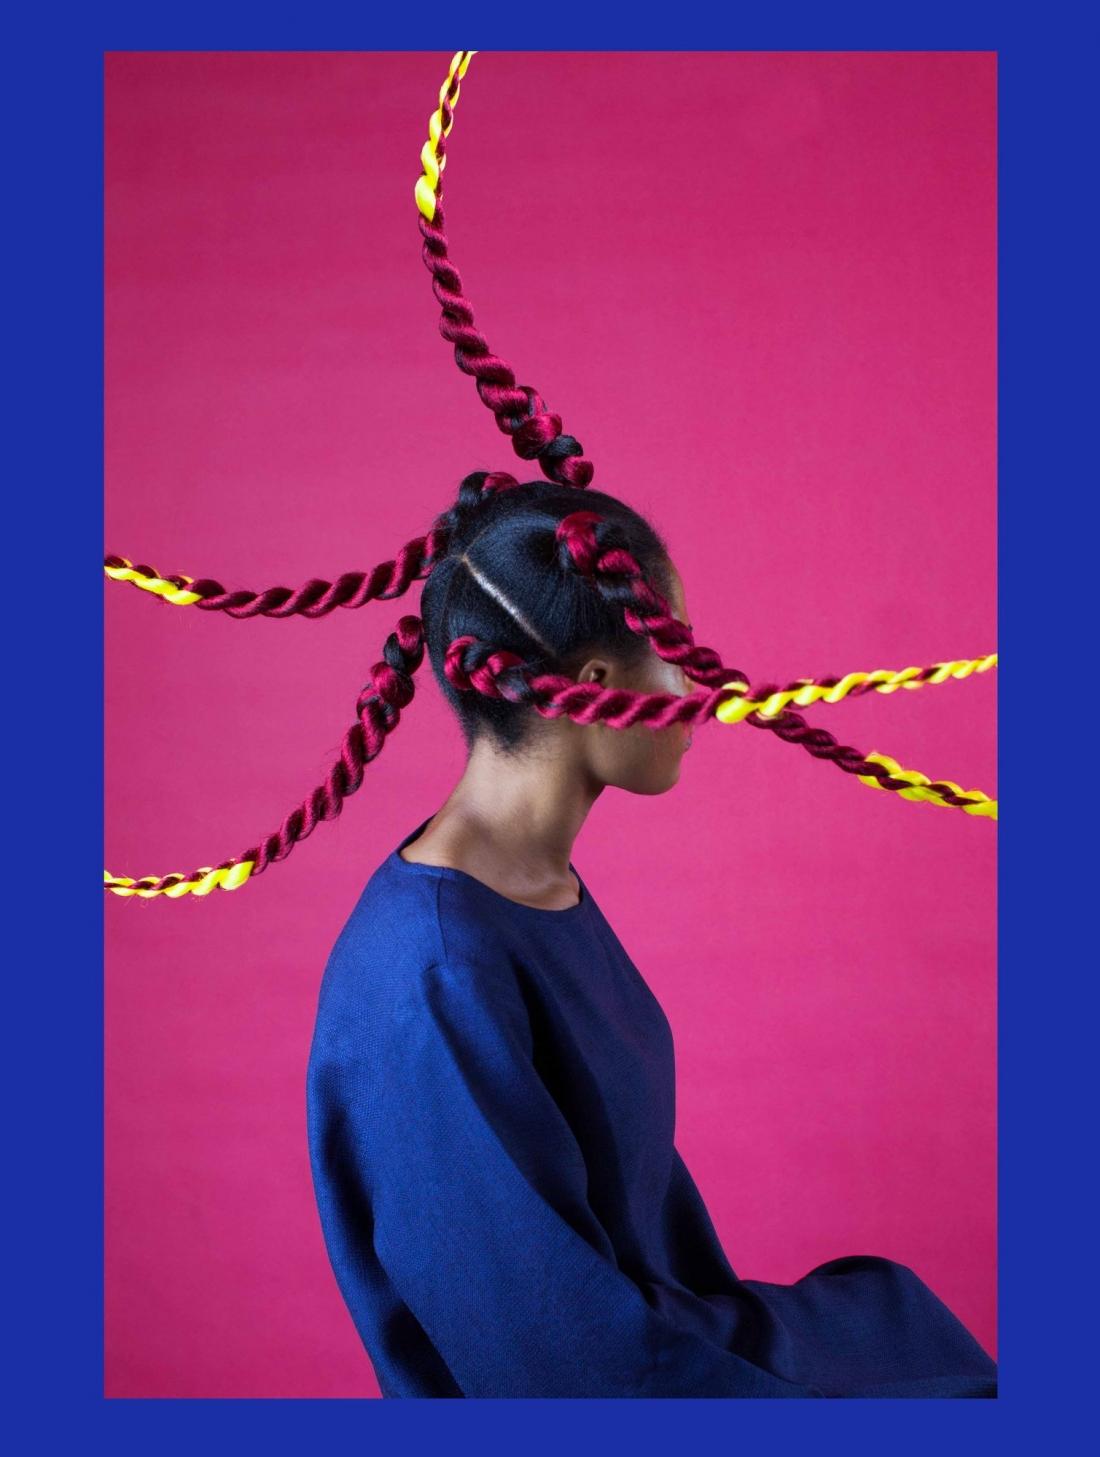 Chroma © Medina Dugger. Open Series Winner, Magnum and LensCulture Photography Awards 2017